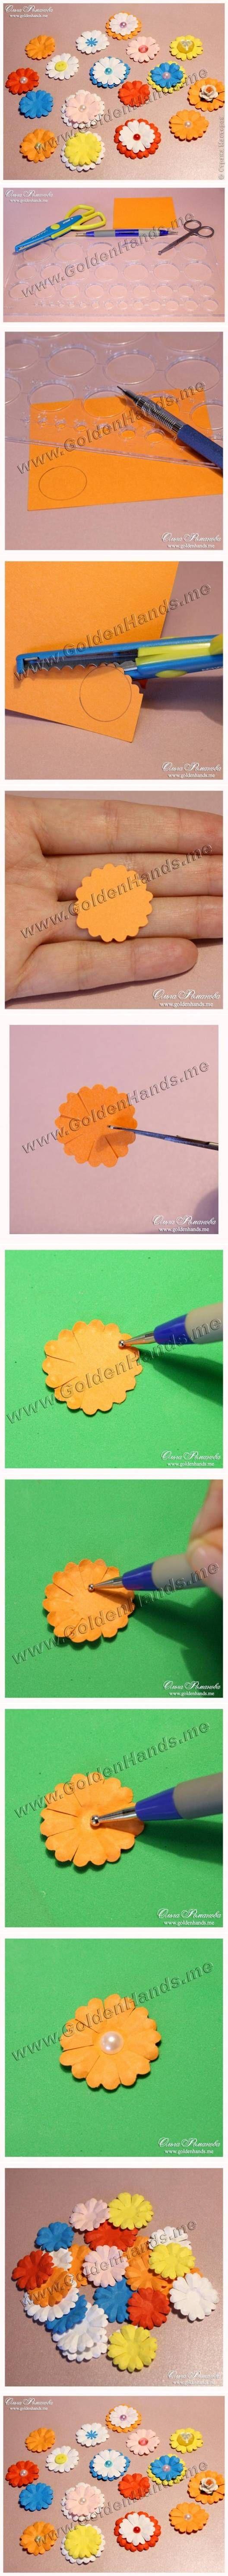 DIY Easy Paper Flowers DIY Projects   UsefulDIY.com Follow Us on Facebook ==> http://www.facebook.com/UsefulDiy